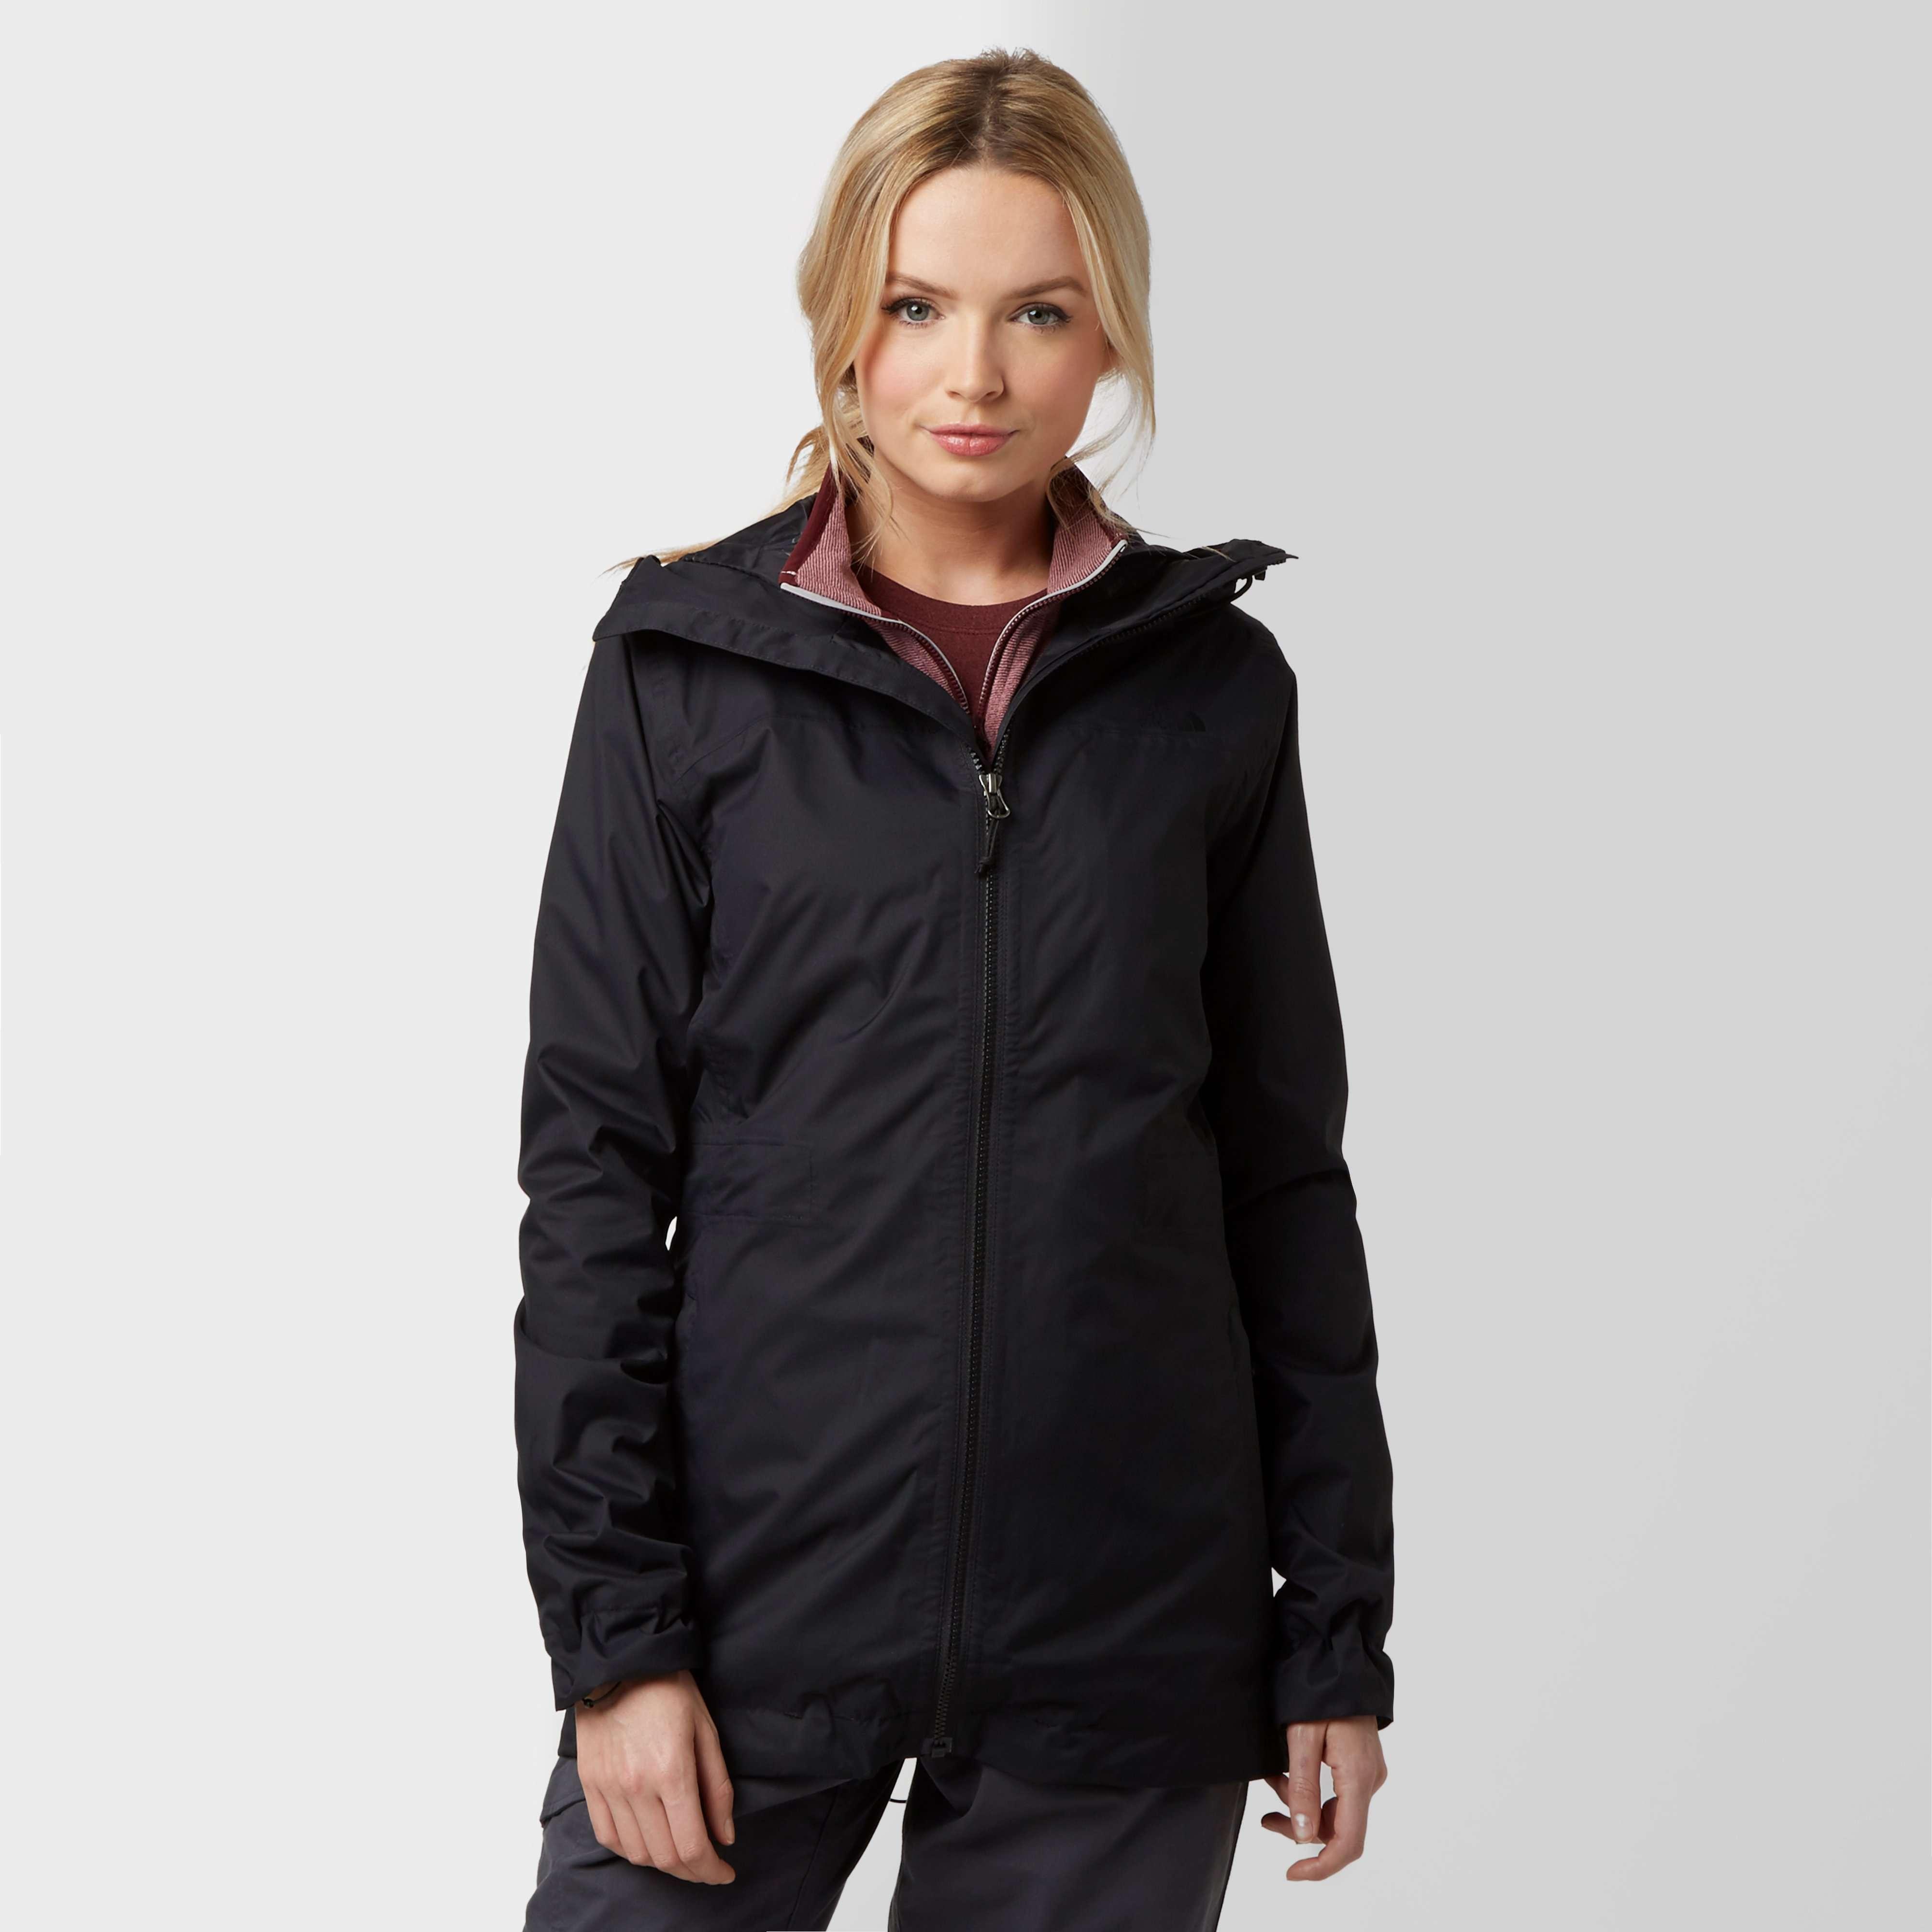 THE NORTH FACE Women's Morton Jacket